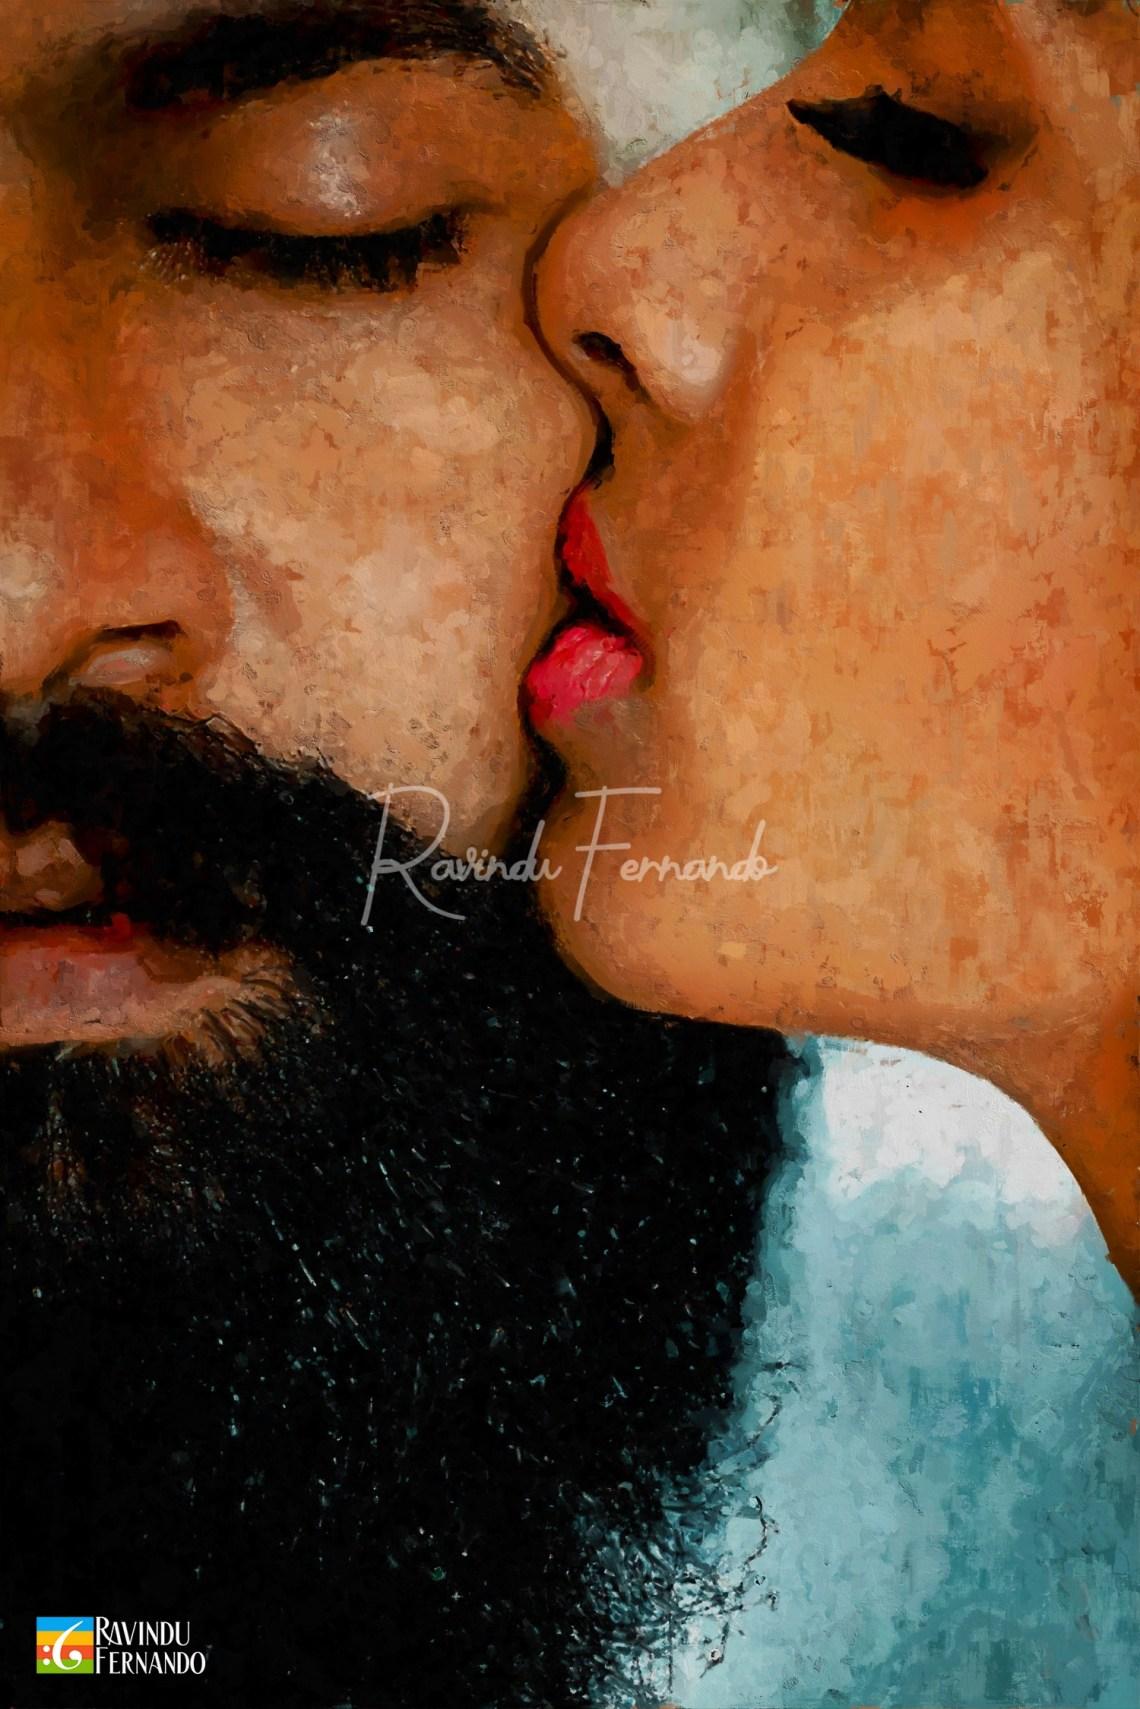 Manoja Fernandez (The Kiss) Digital Painting